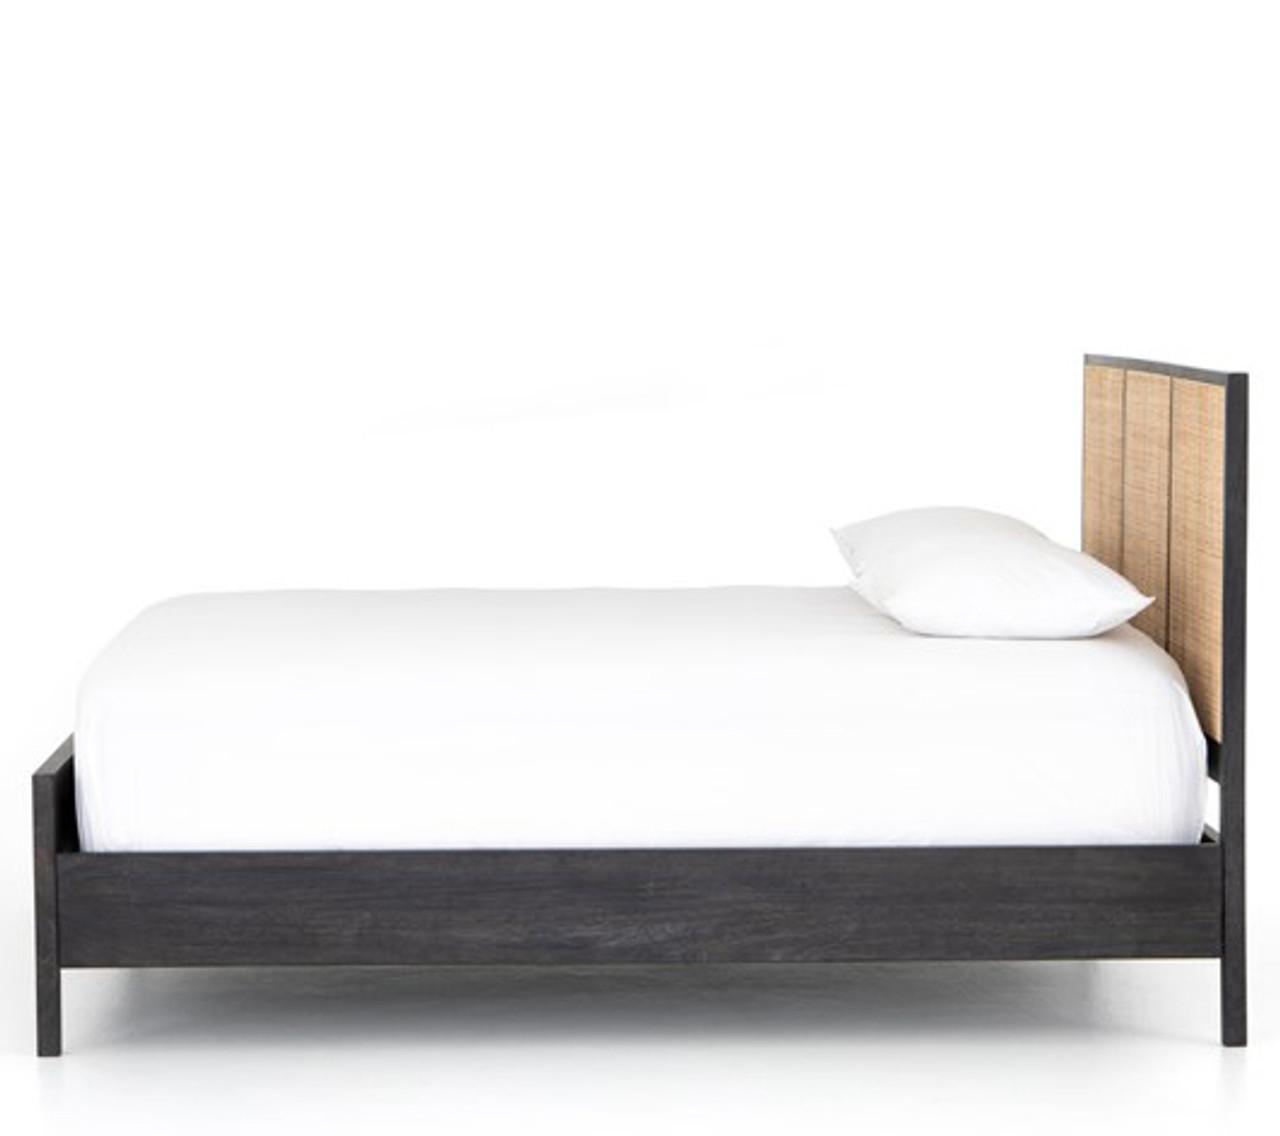 Bondi Woven Cane Bed